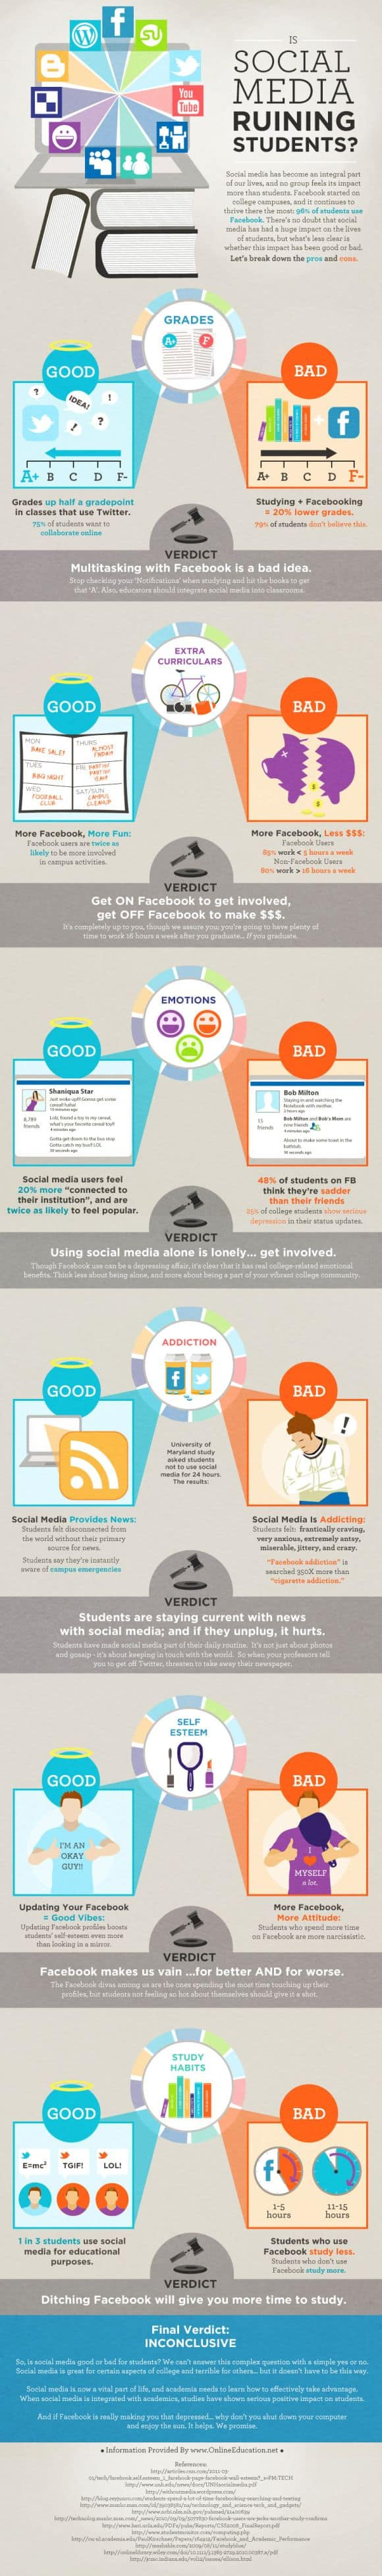 Social-Media-and-Students-small